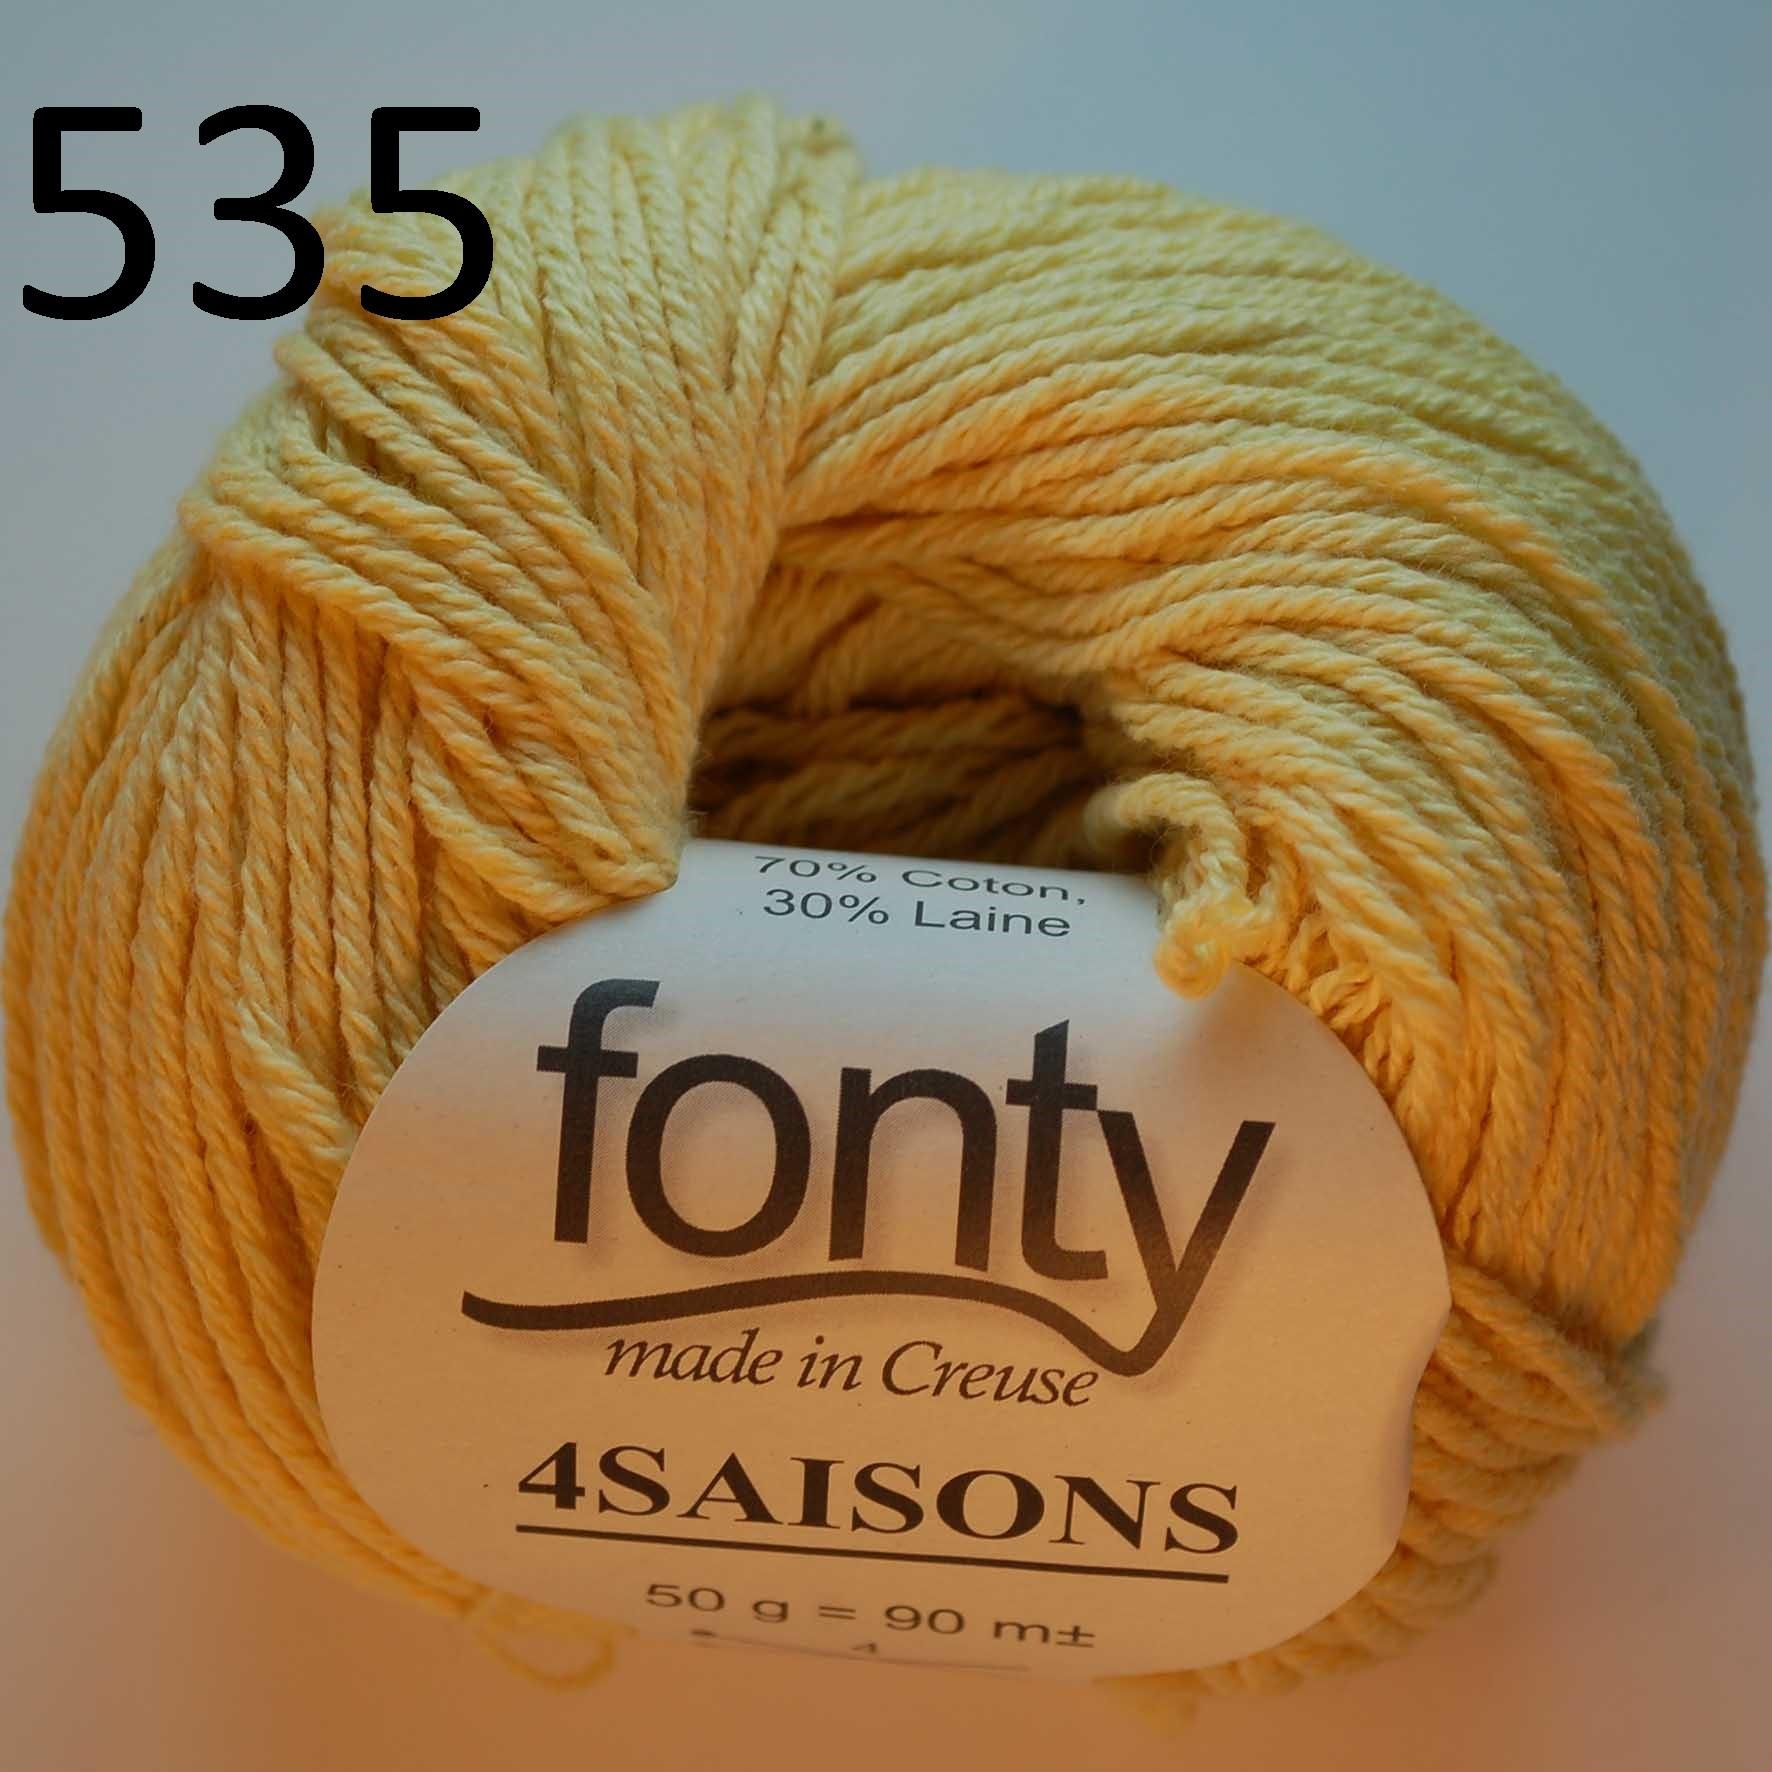 4 Saisons 535